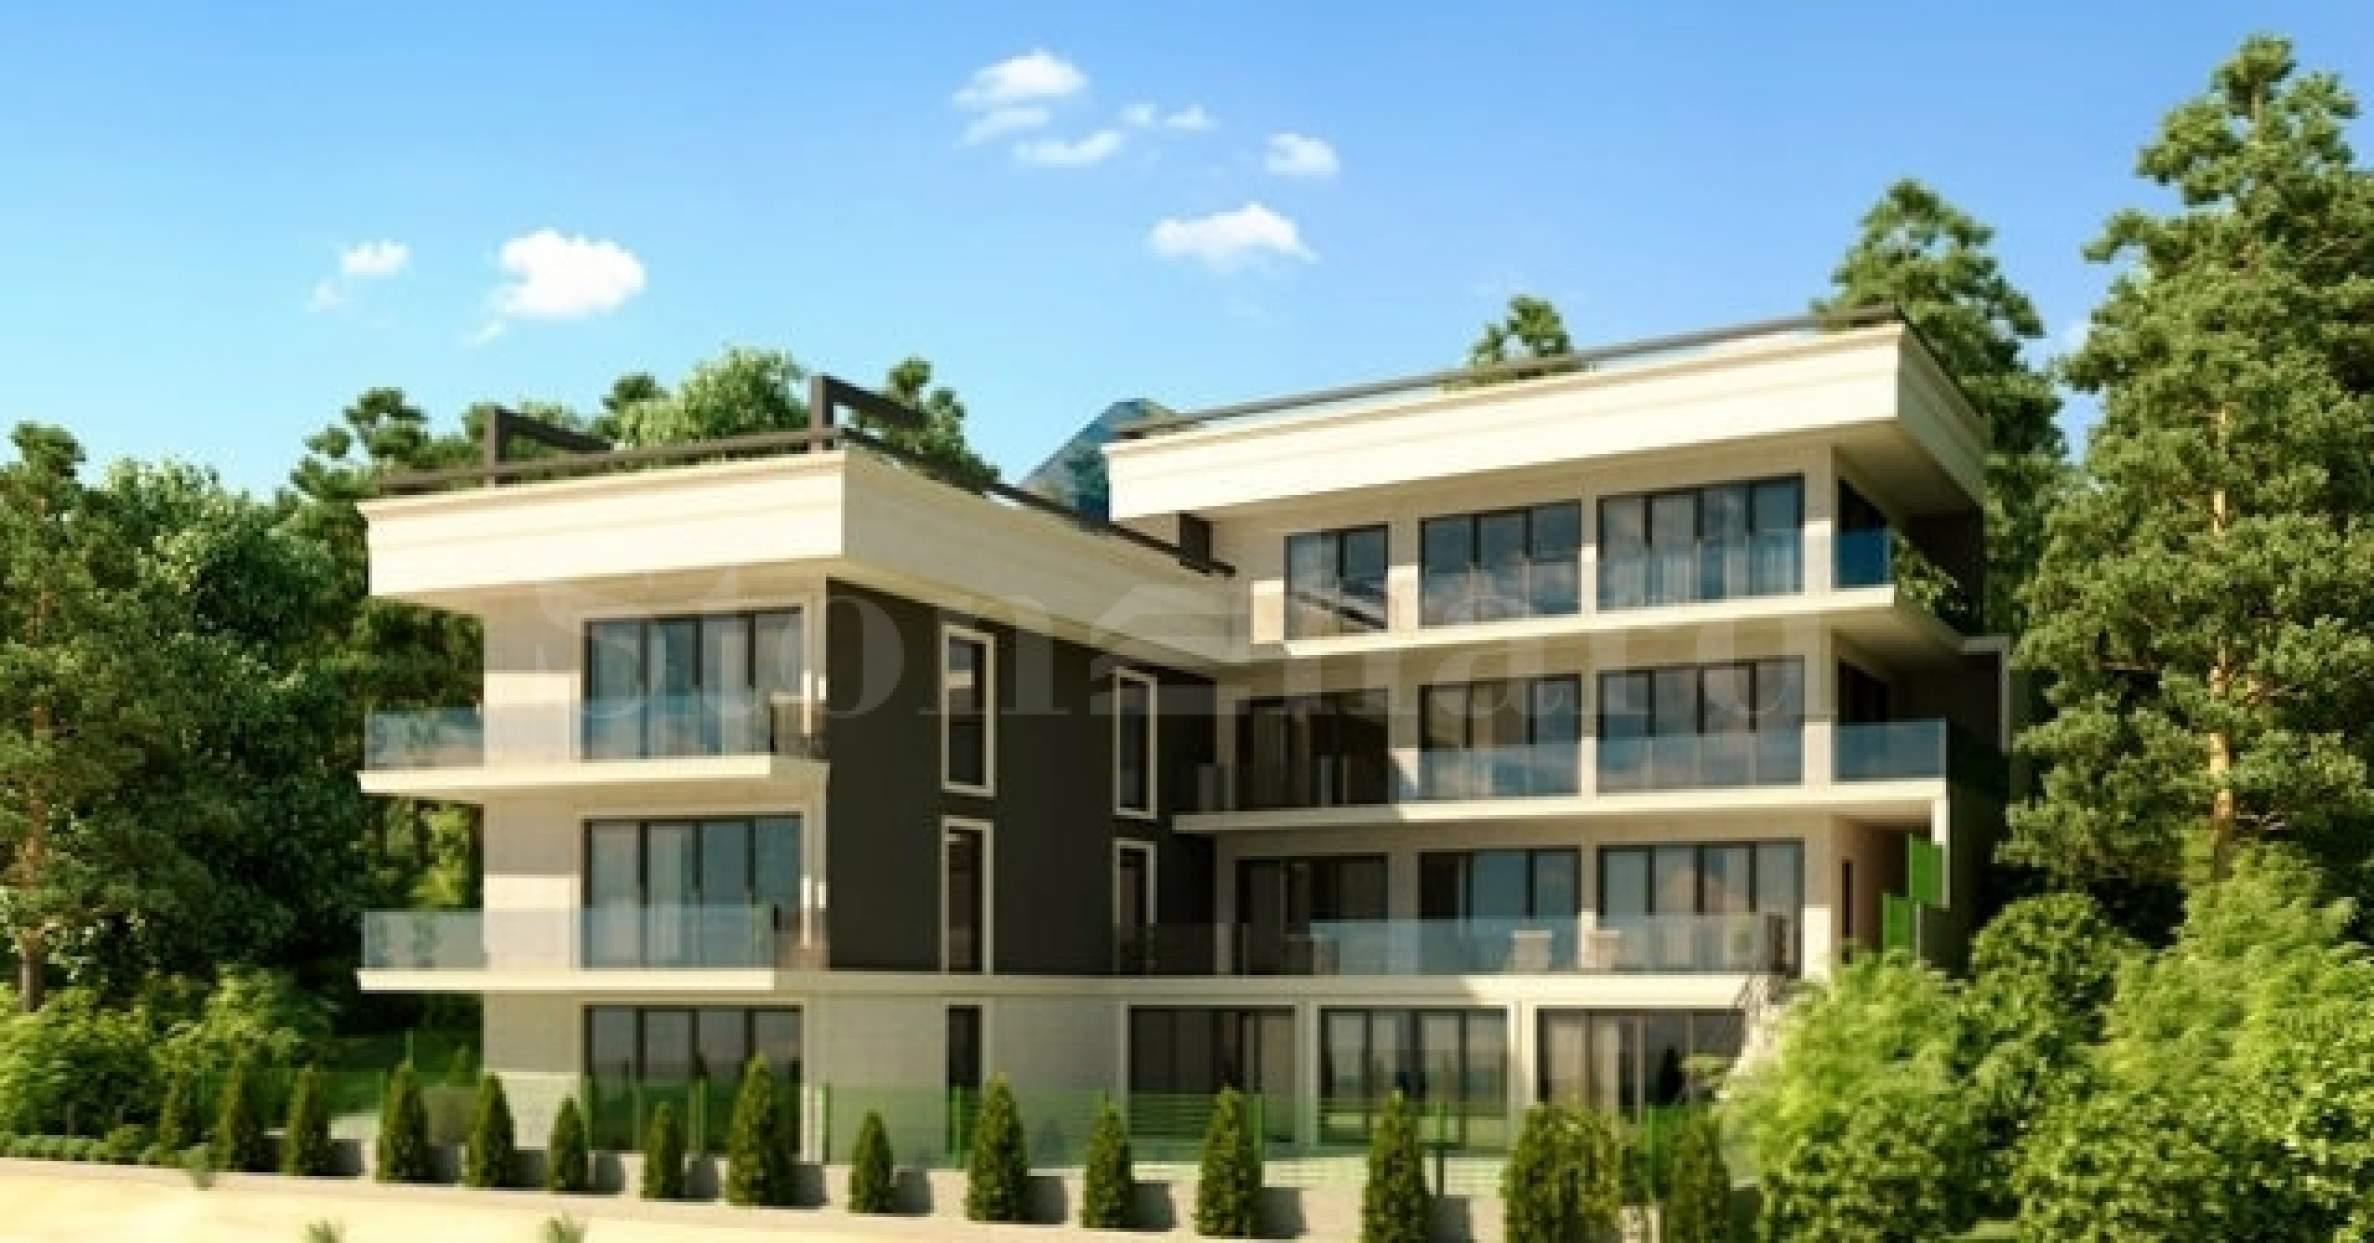 Апартаменти в комплекс на плажа2 - Stonehard